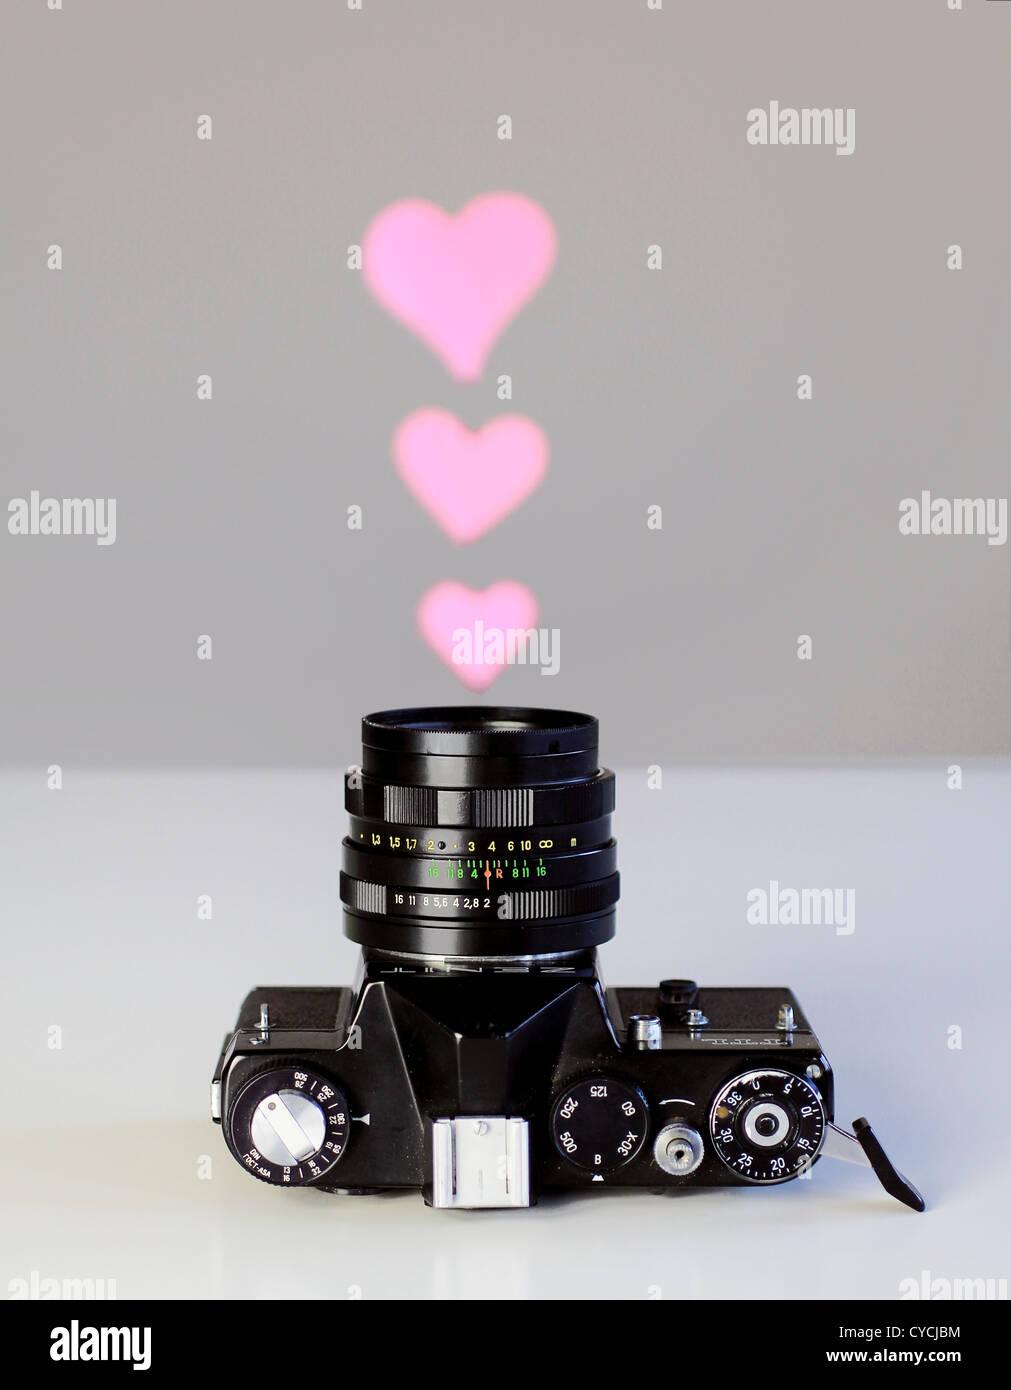 Kamera, Fotografie, Leidenschaft Stockbild